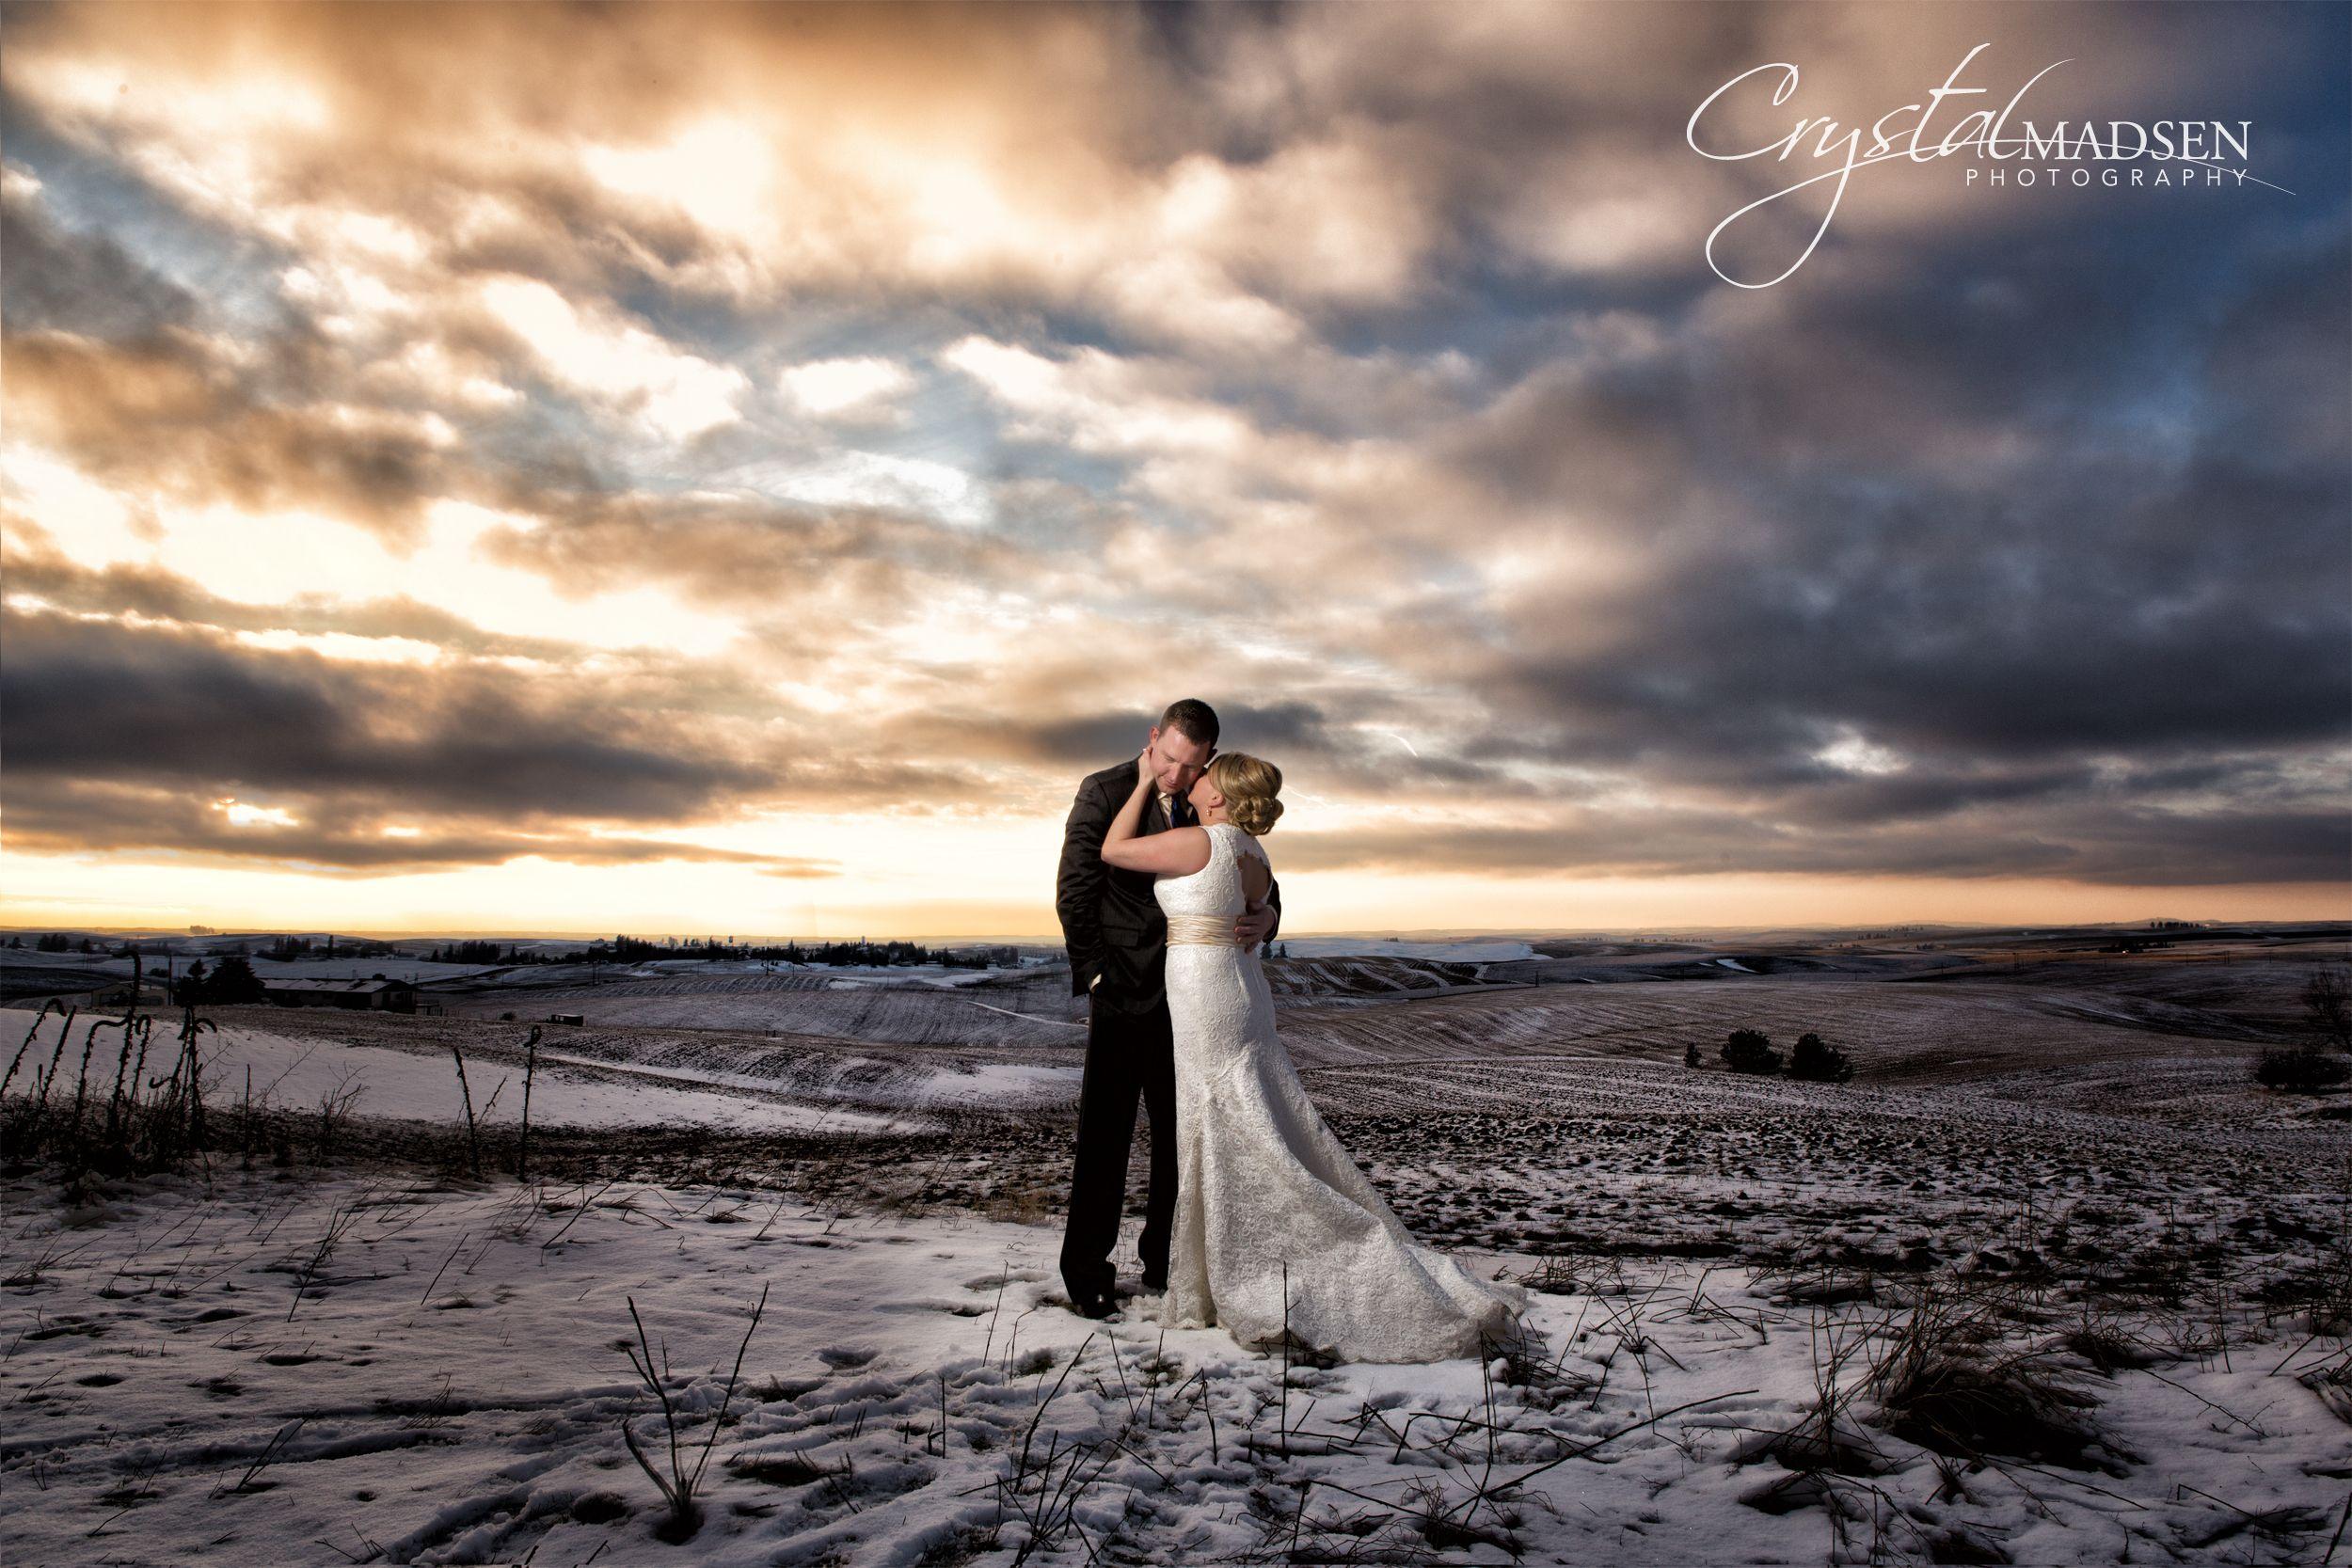 Outdoor Winter Wedding Photography: Stunning Outdoor Winter Wedding Photography.